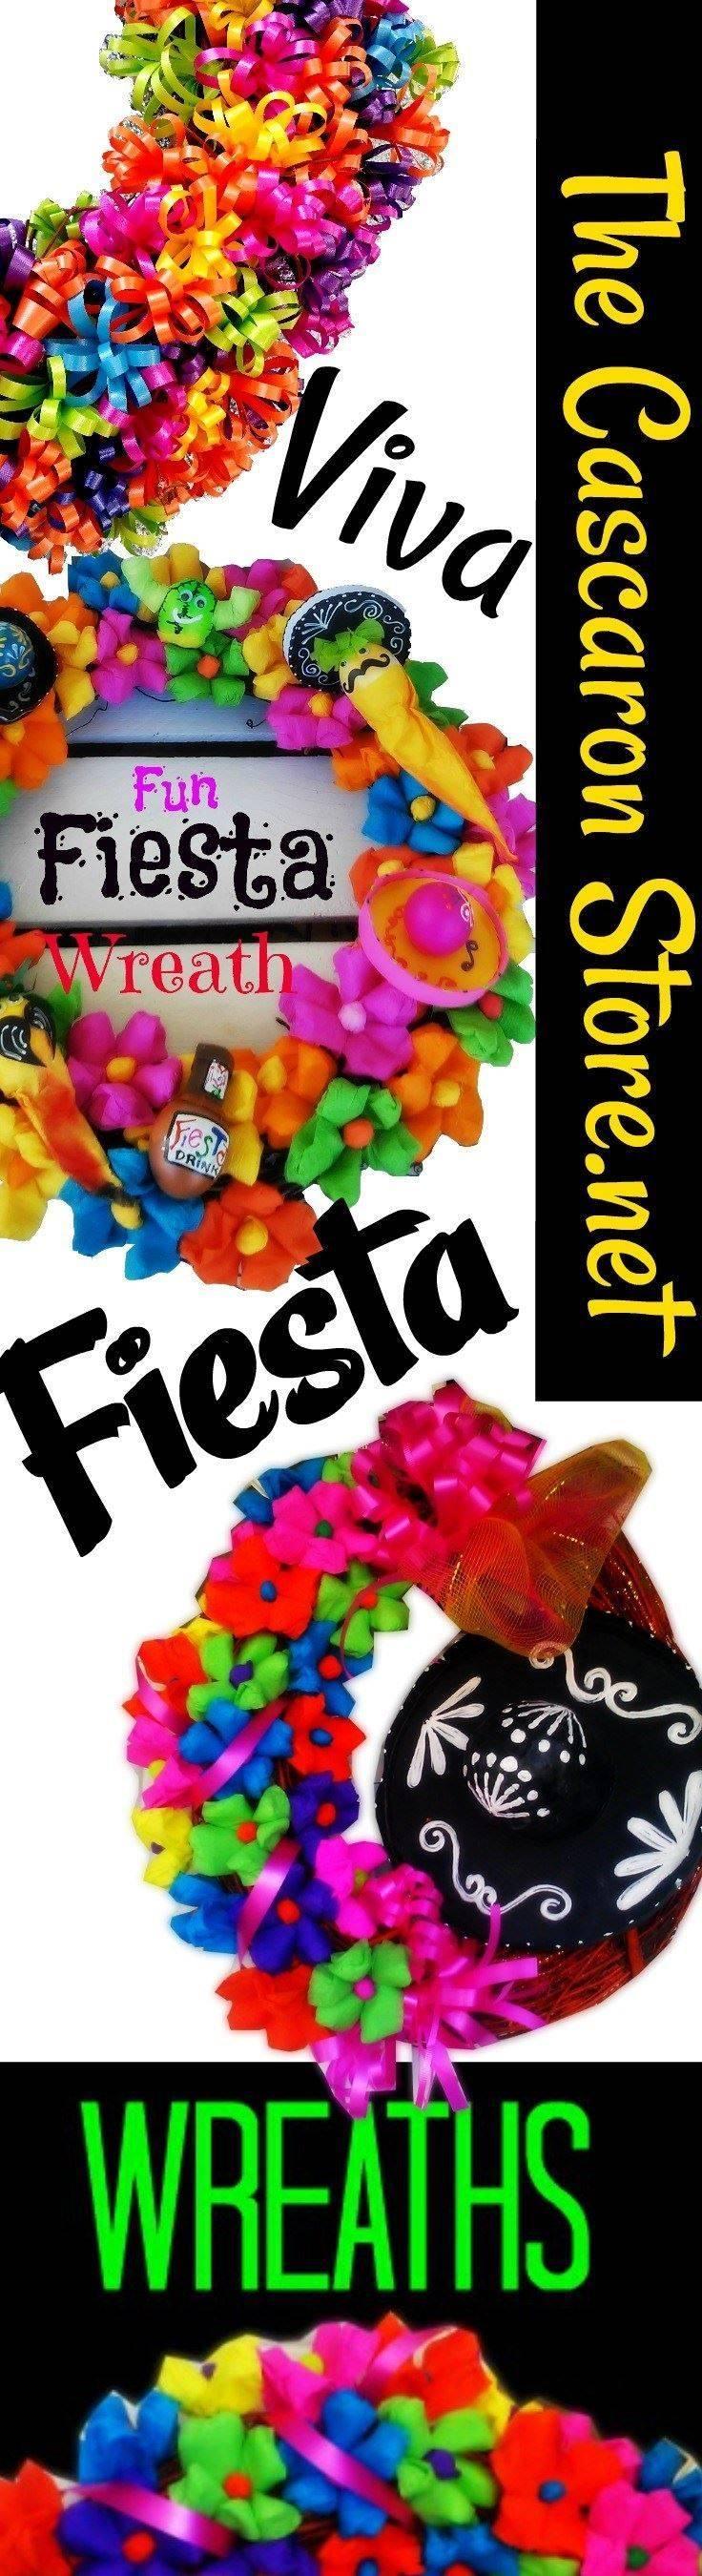 fiesta wreaths in San Antonio